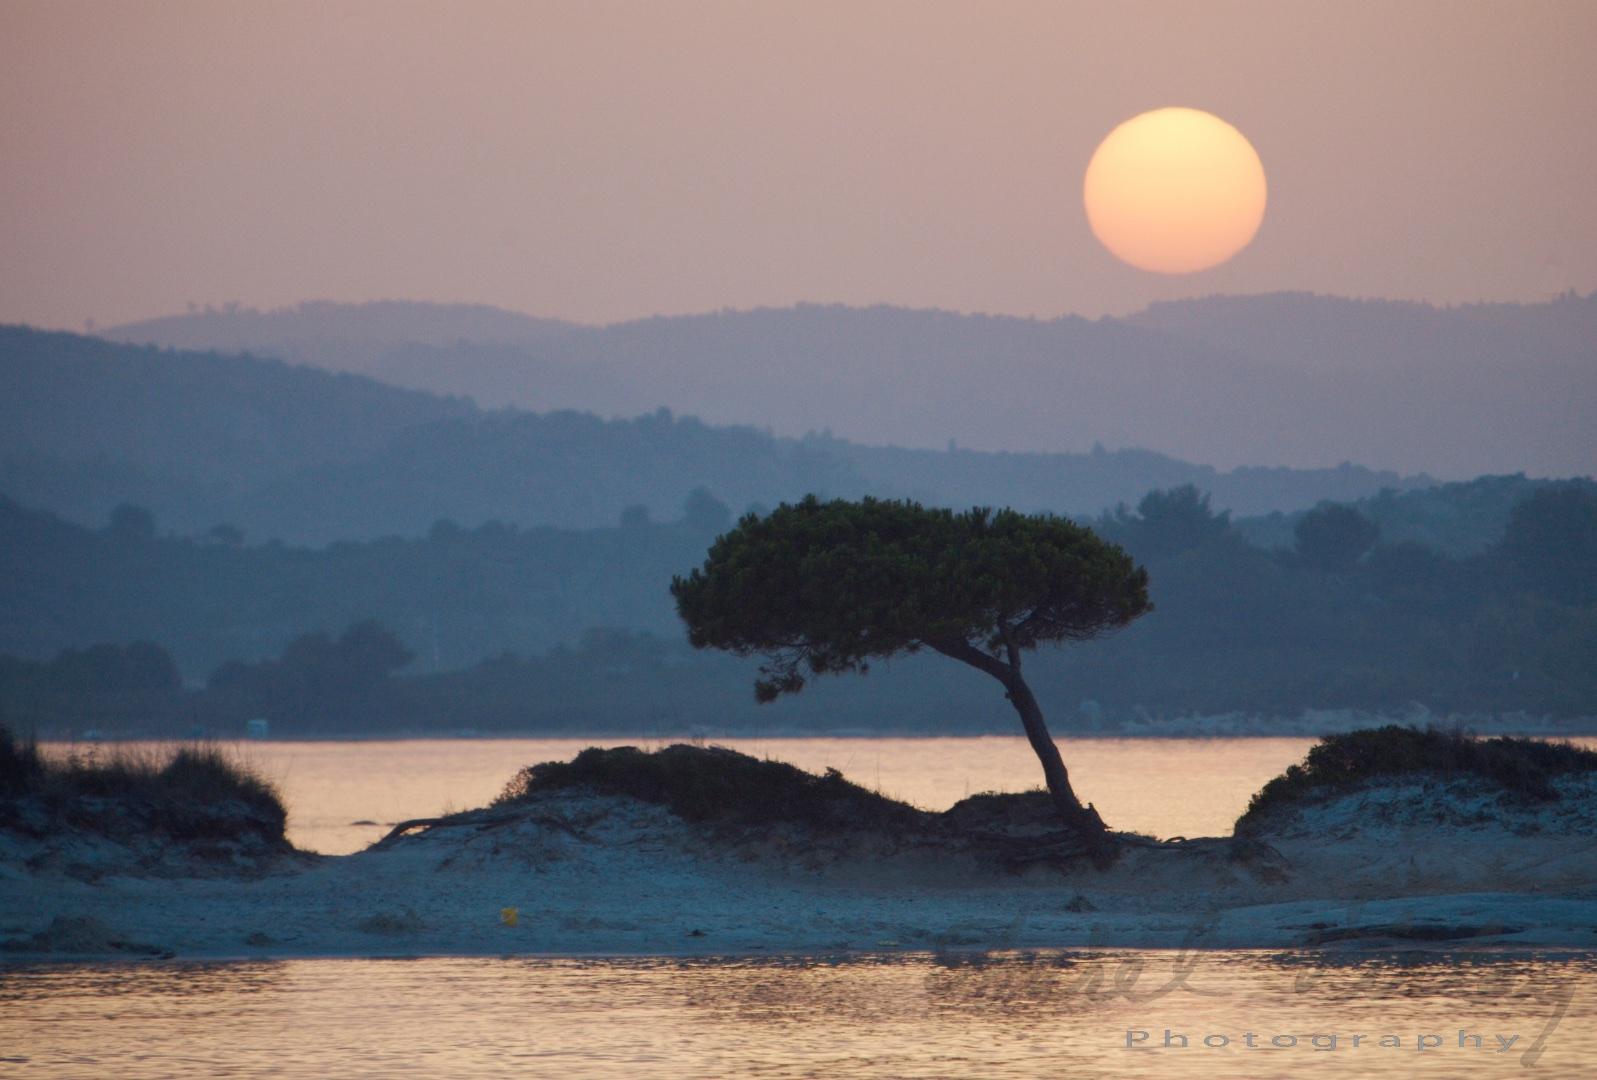 Sunset over tree in Greece. Landscape photograph by Aurel Virlan